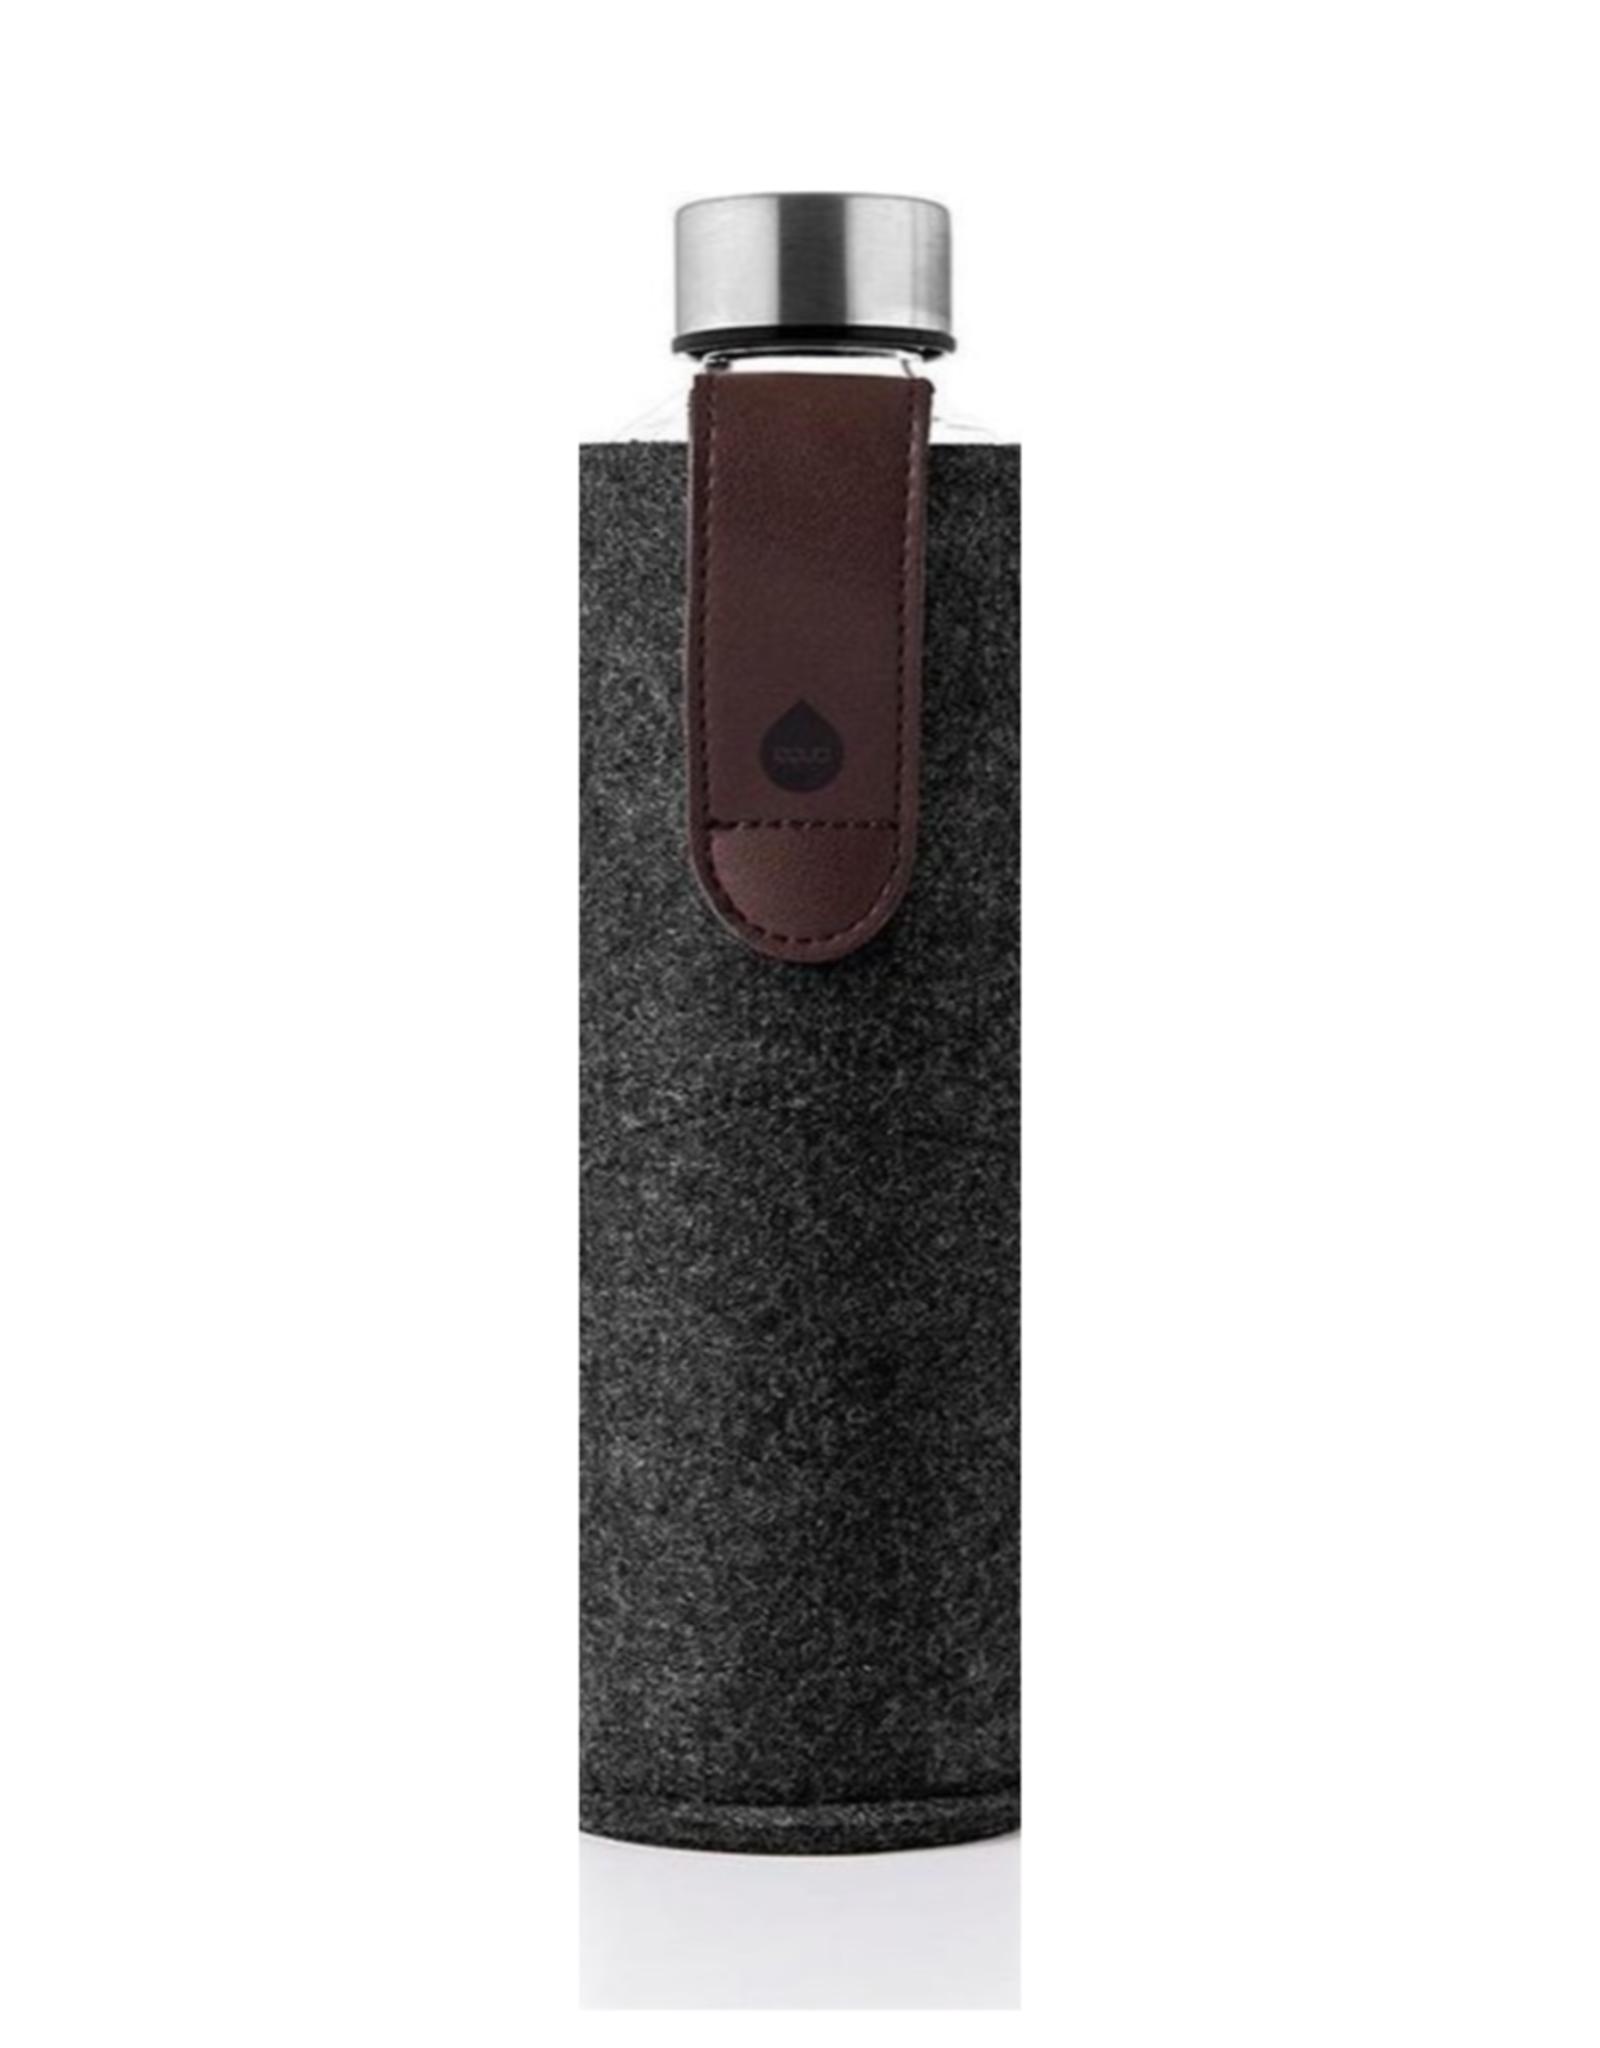 Equa EXTRA vilten covers Equa mismatch glass bottle 750 ml